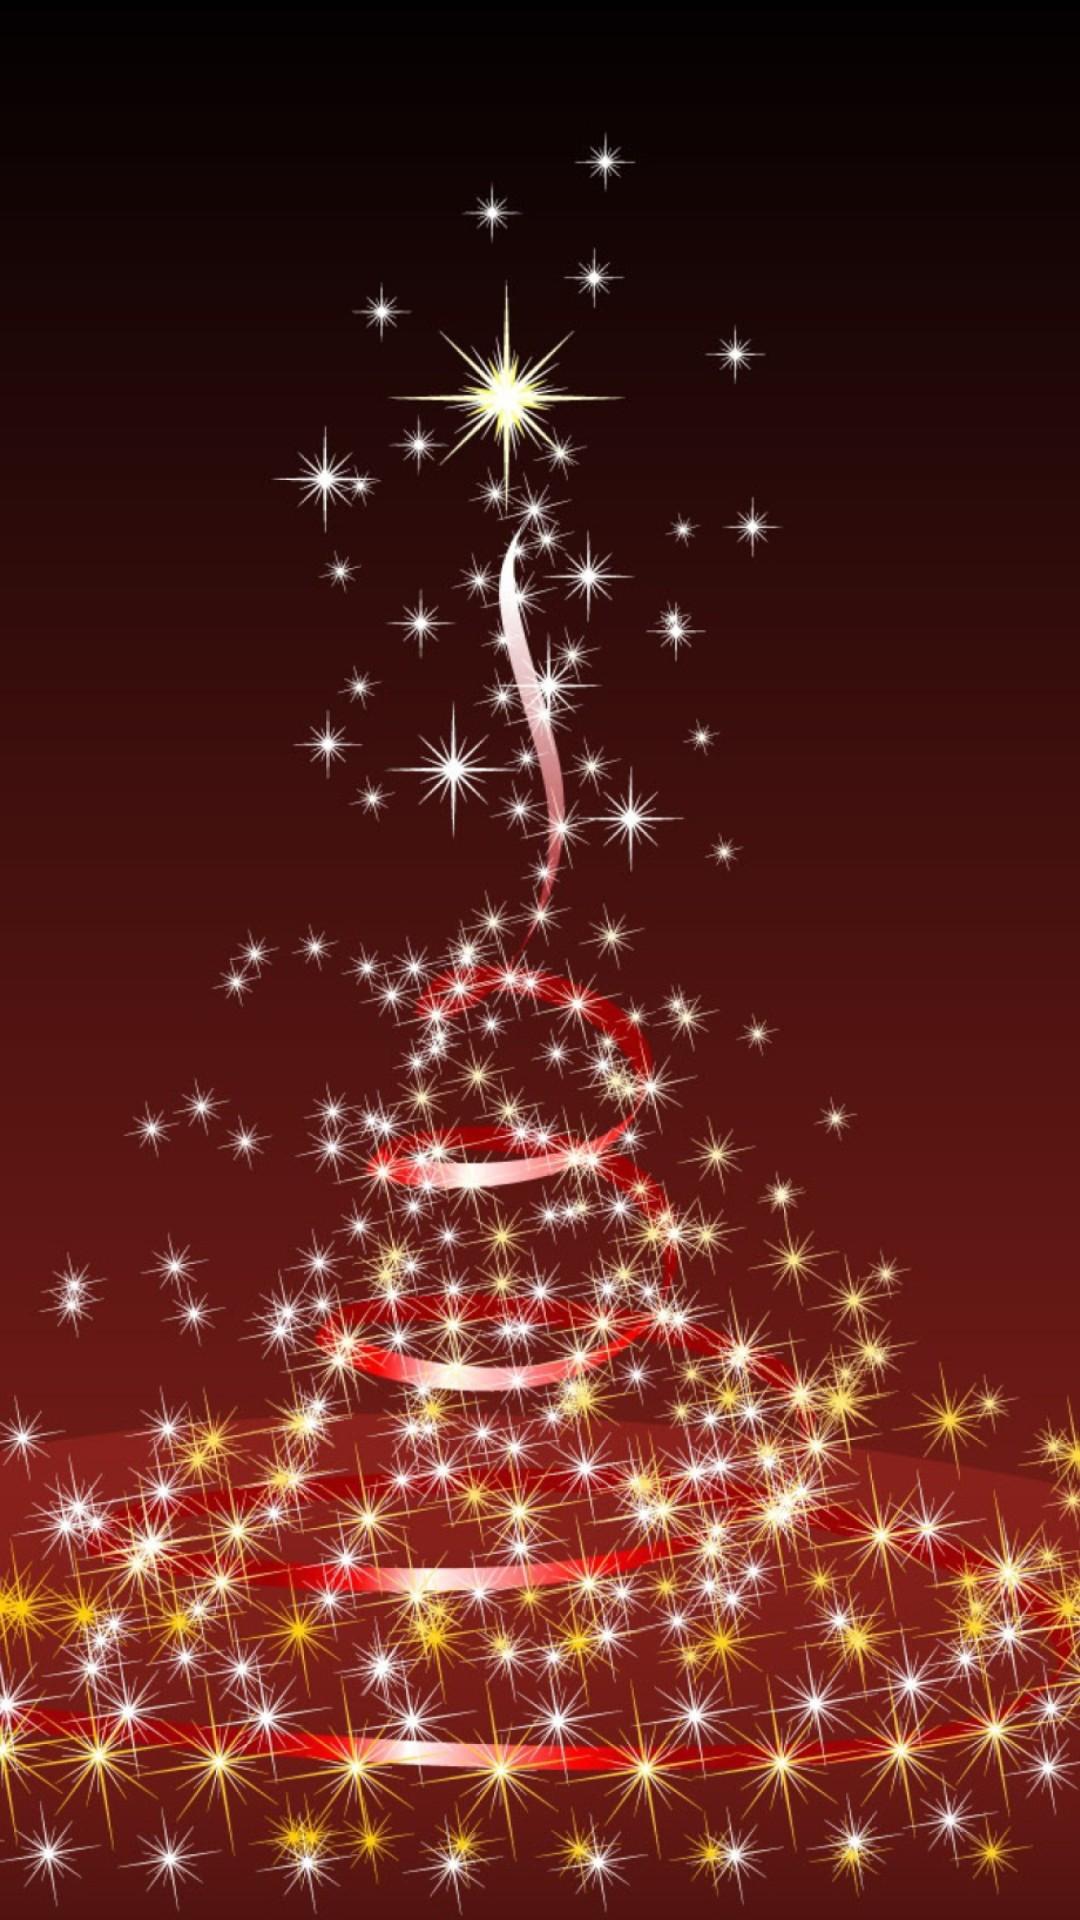 Merry Christmas Lights 1080×1920.